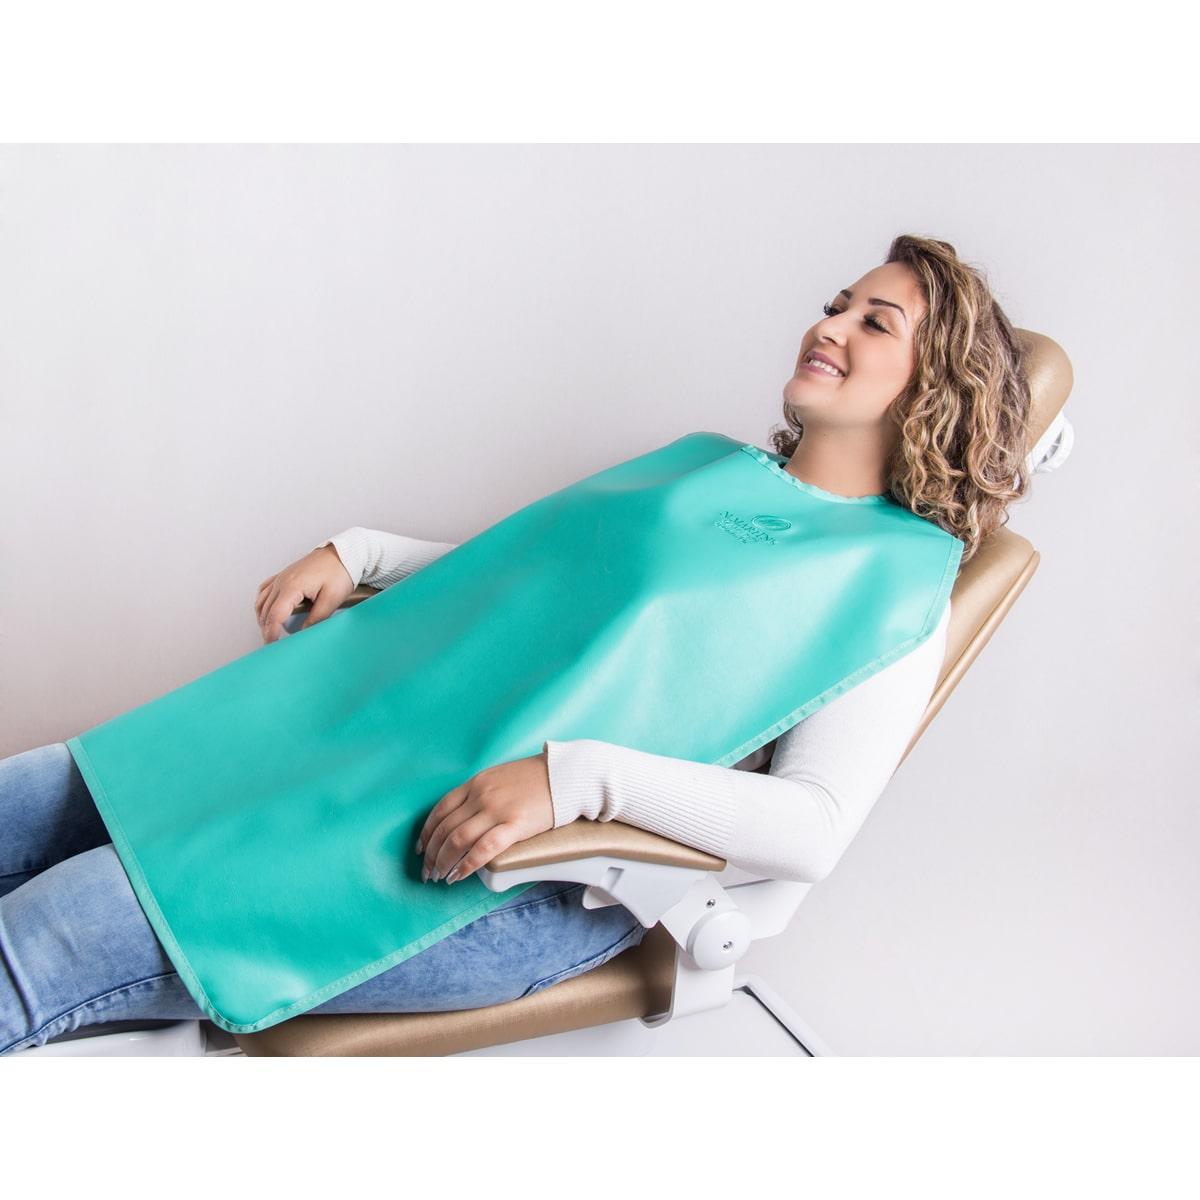 Avental Periapical sem protetor de tireoide - 85x60cm - 0,50mm/Pb - N.Martins